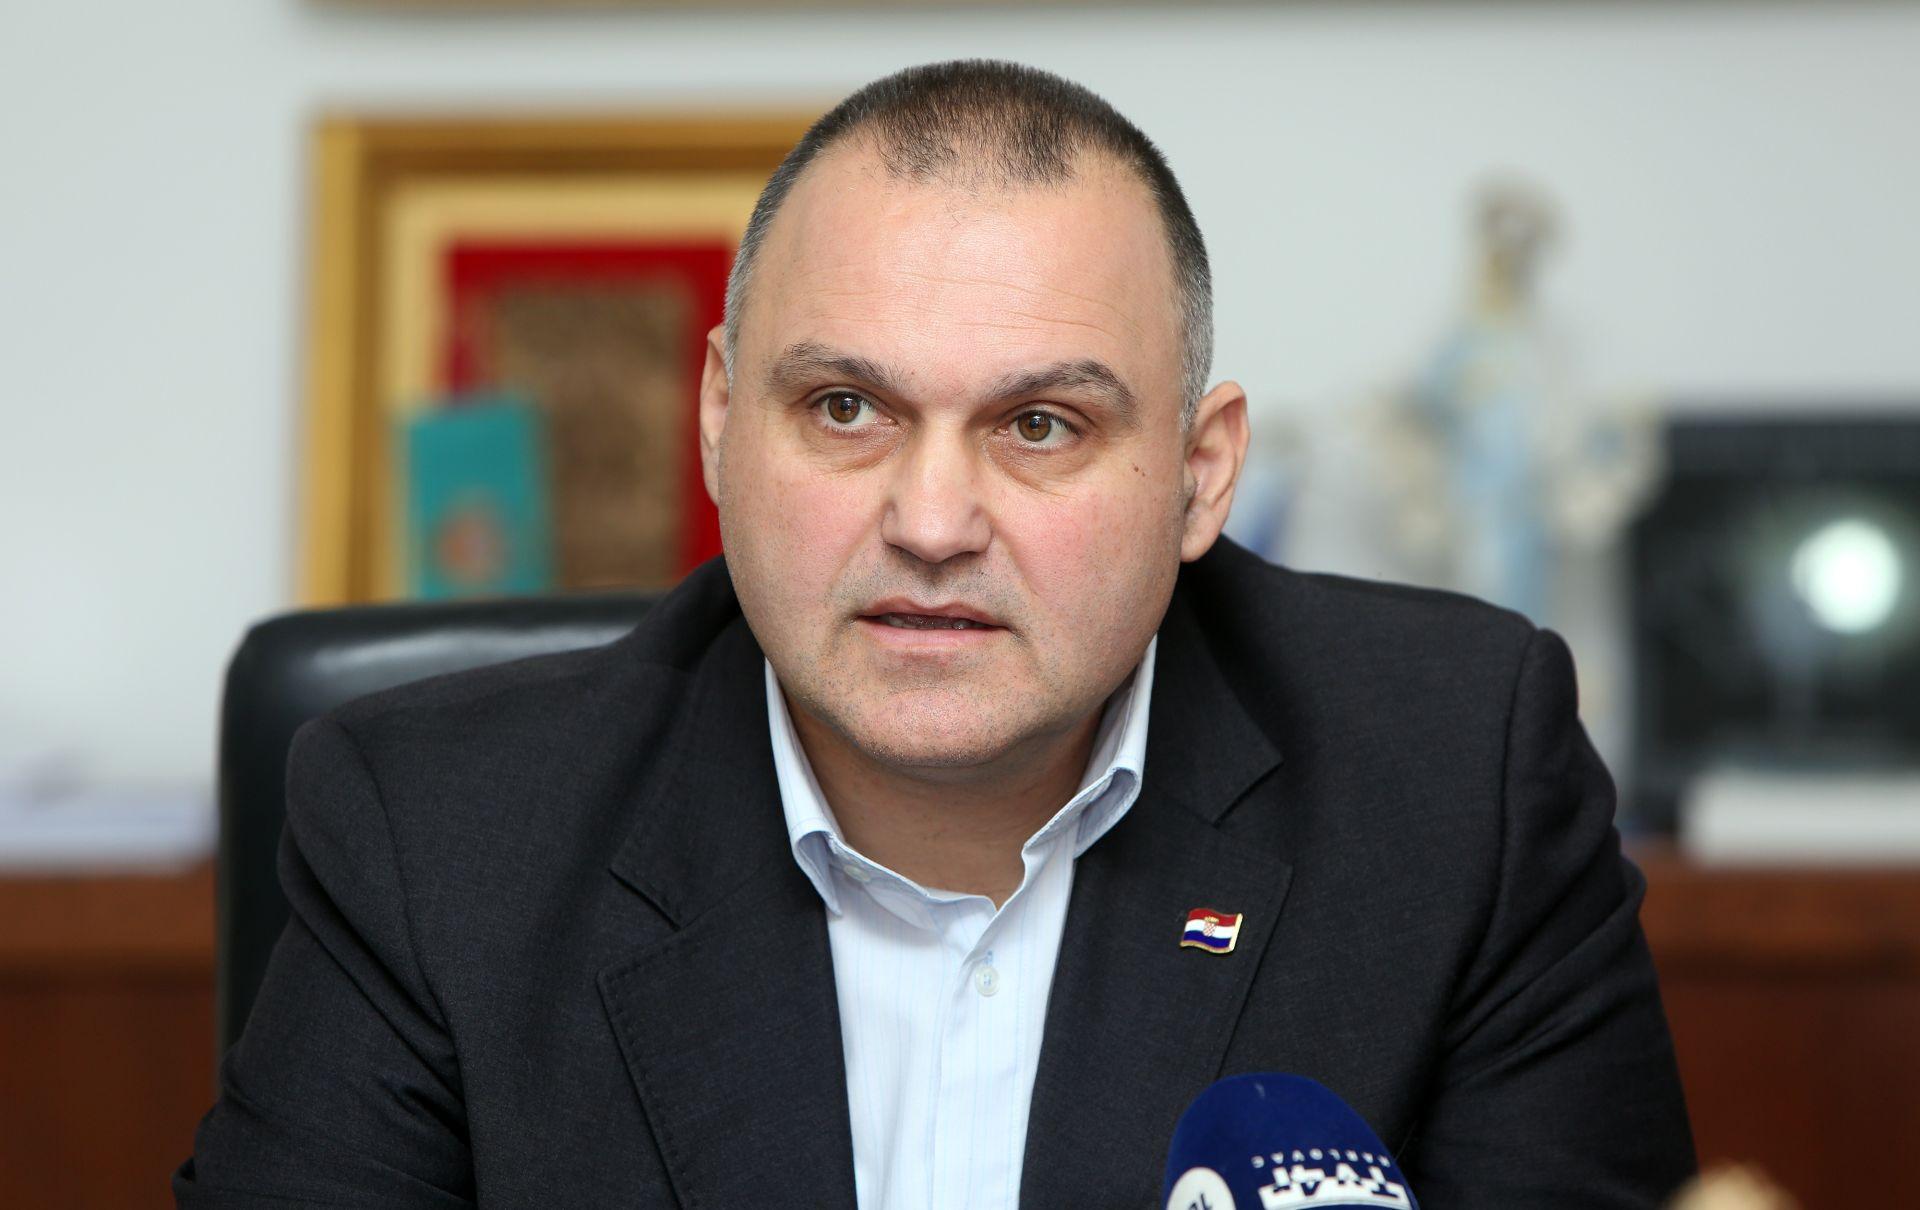 Gradonačelnik Karlovca odbacuje ocjene o diskriminaciji